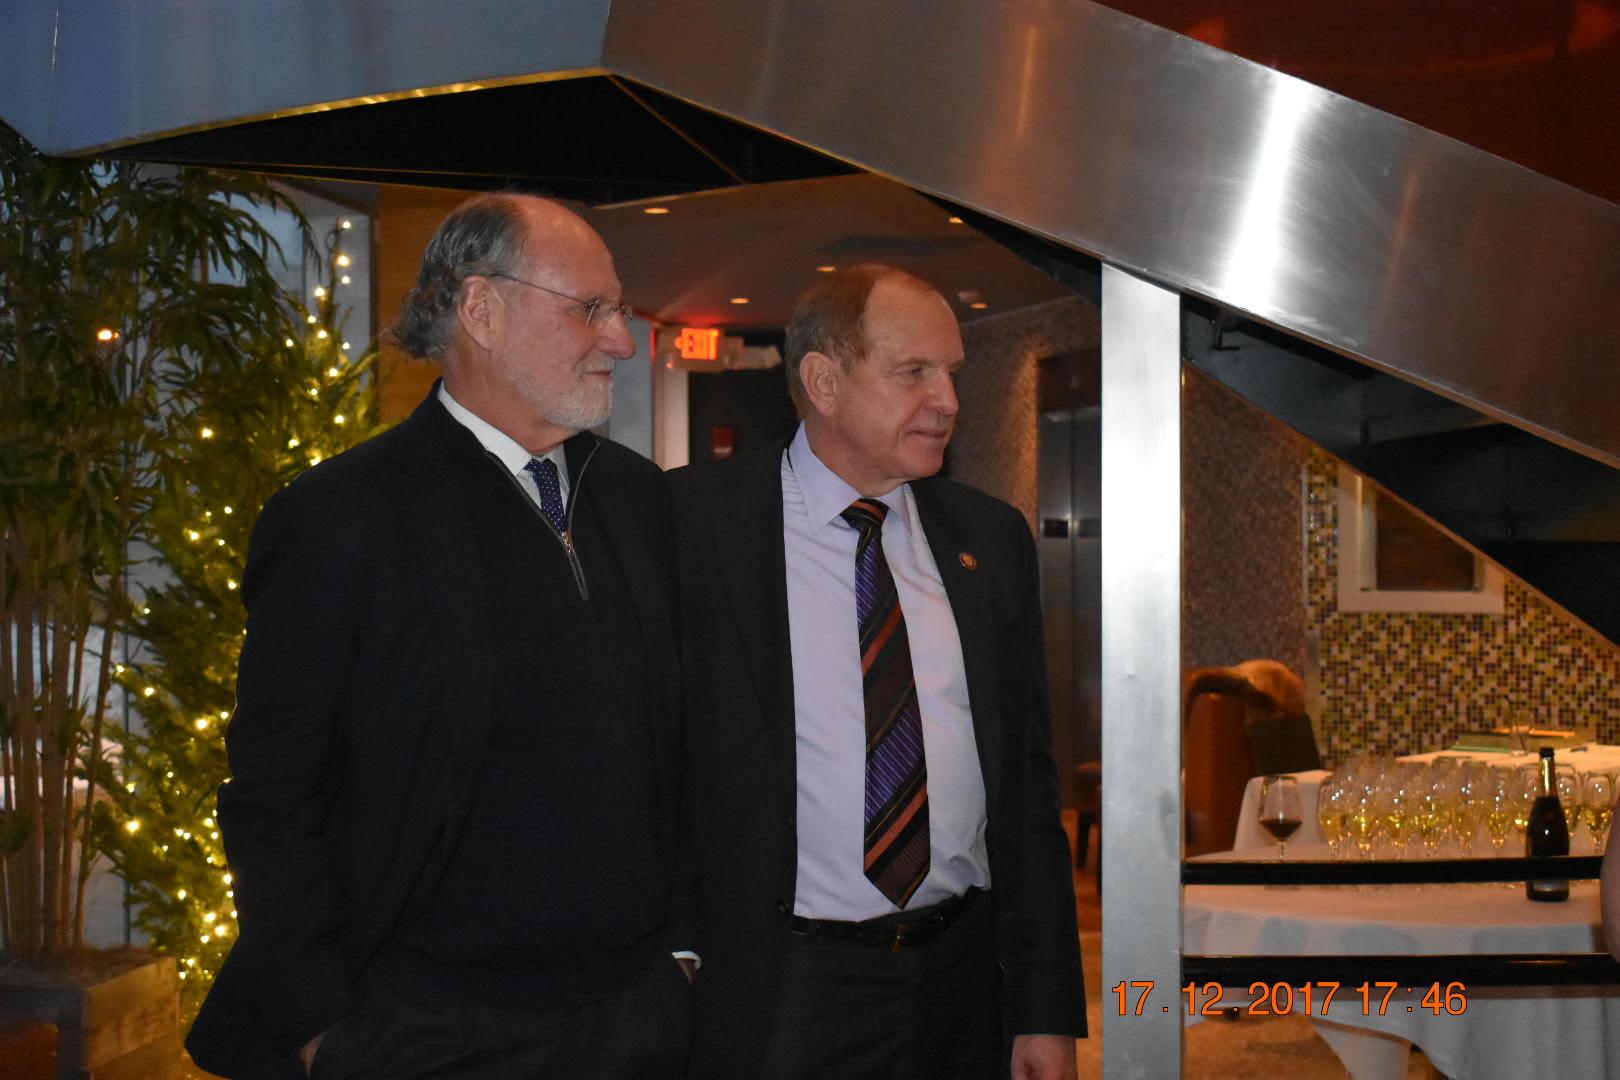 Former New Jersey Governor Jon Corzine and New Jersey State Senator Ray Lesniak